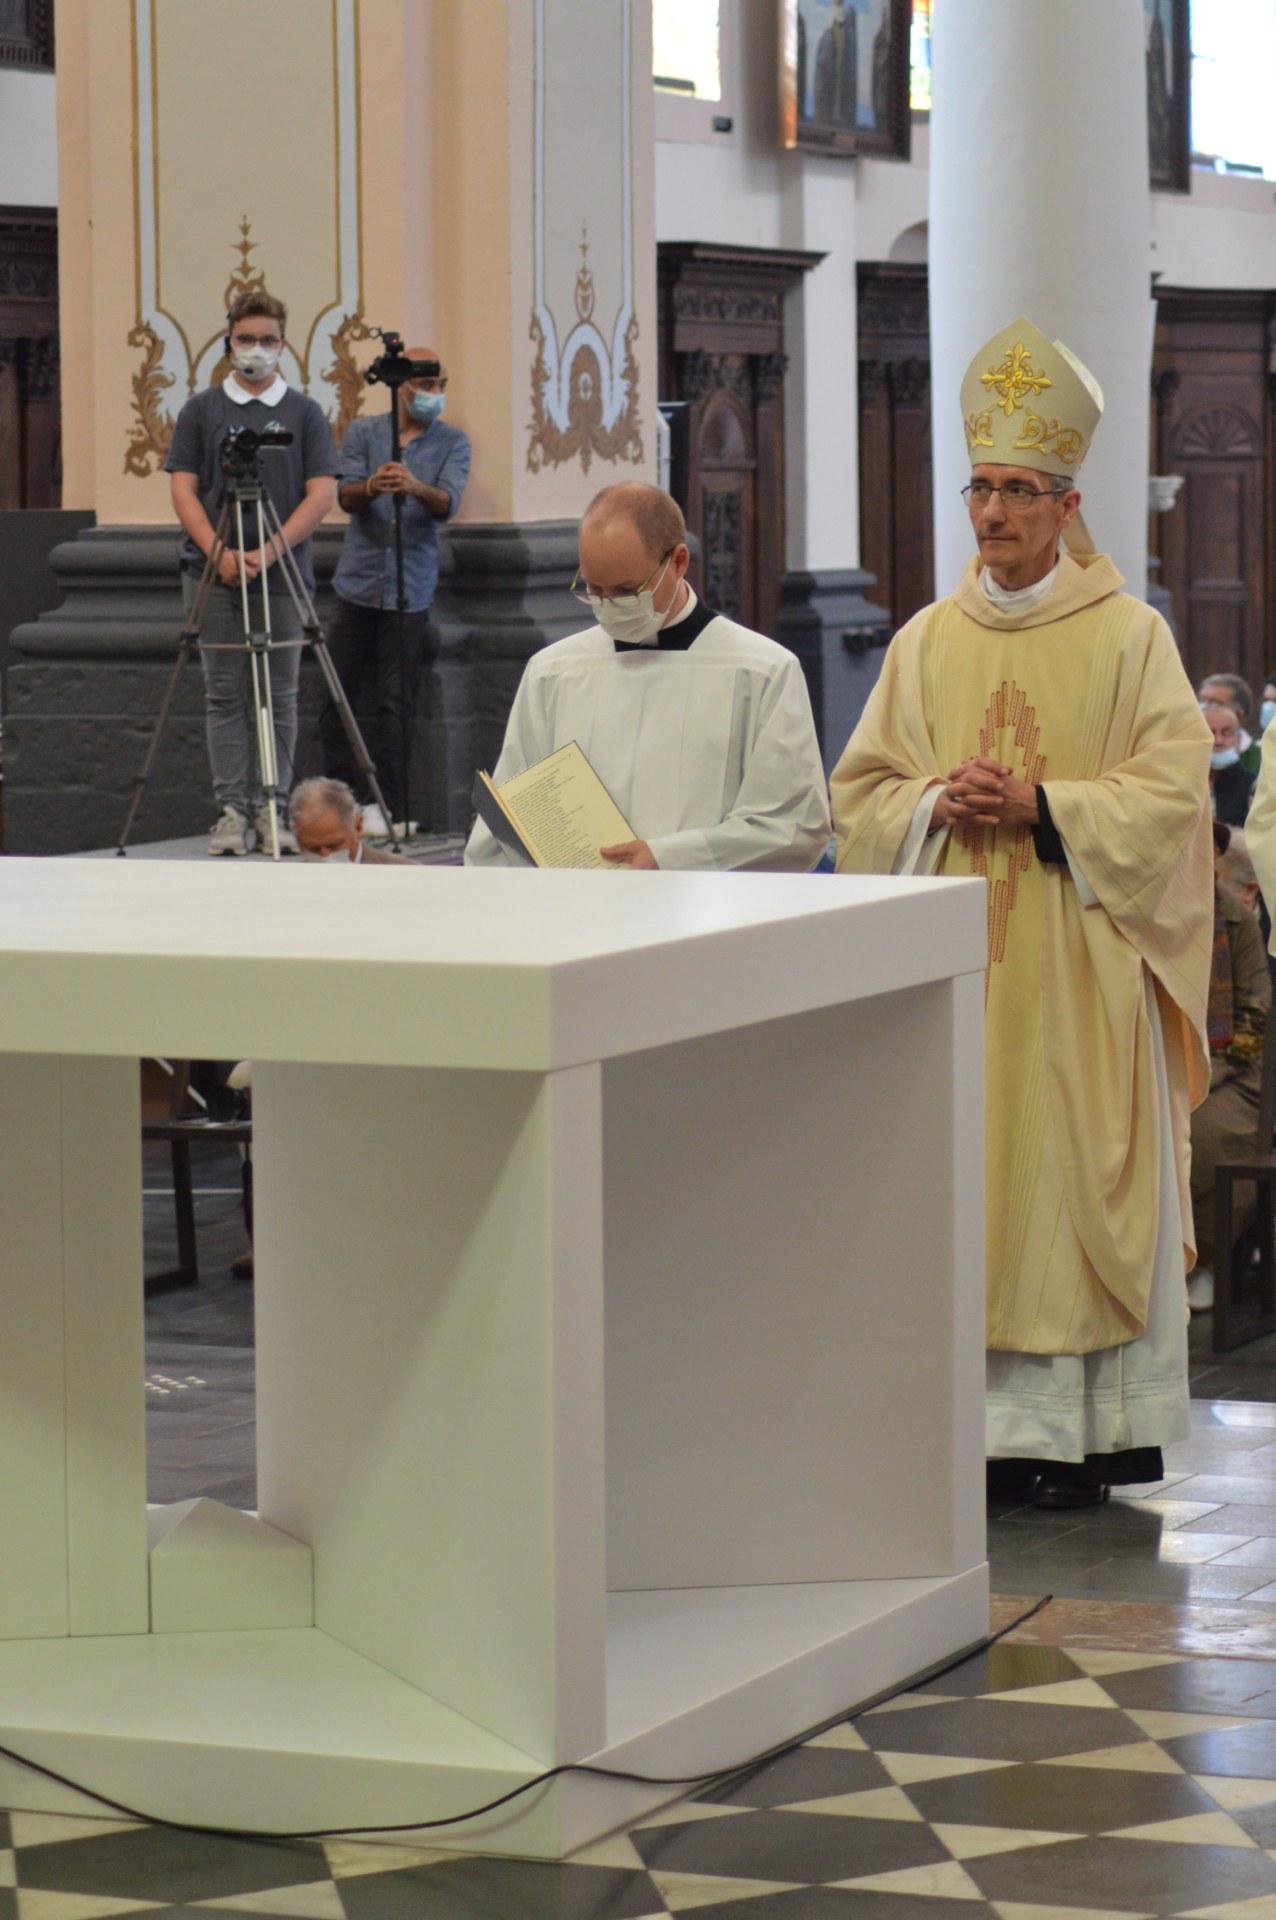 église st martin st amand 110921 5